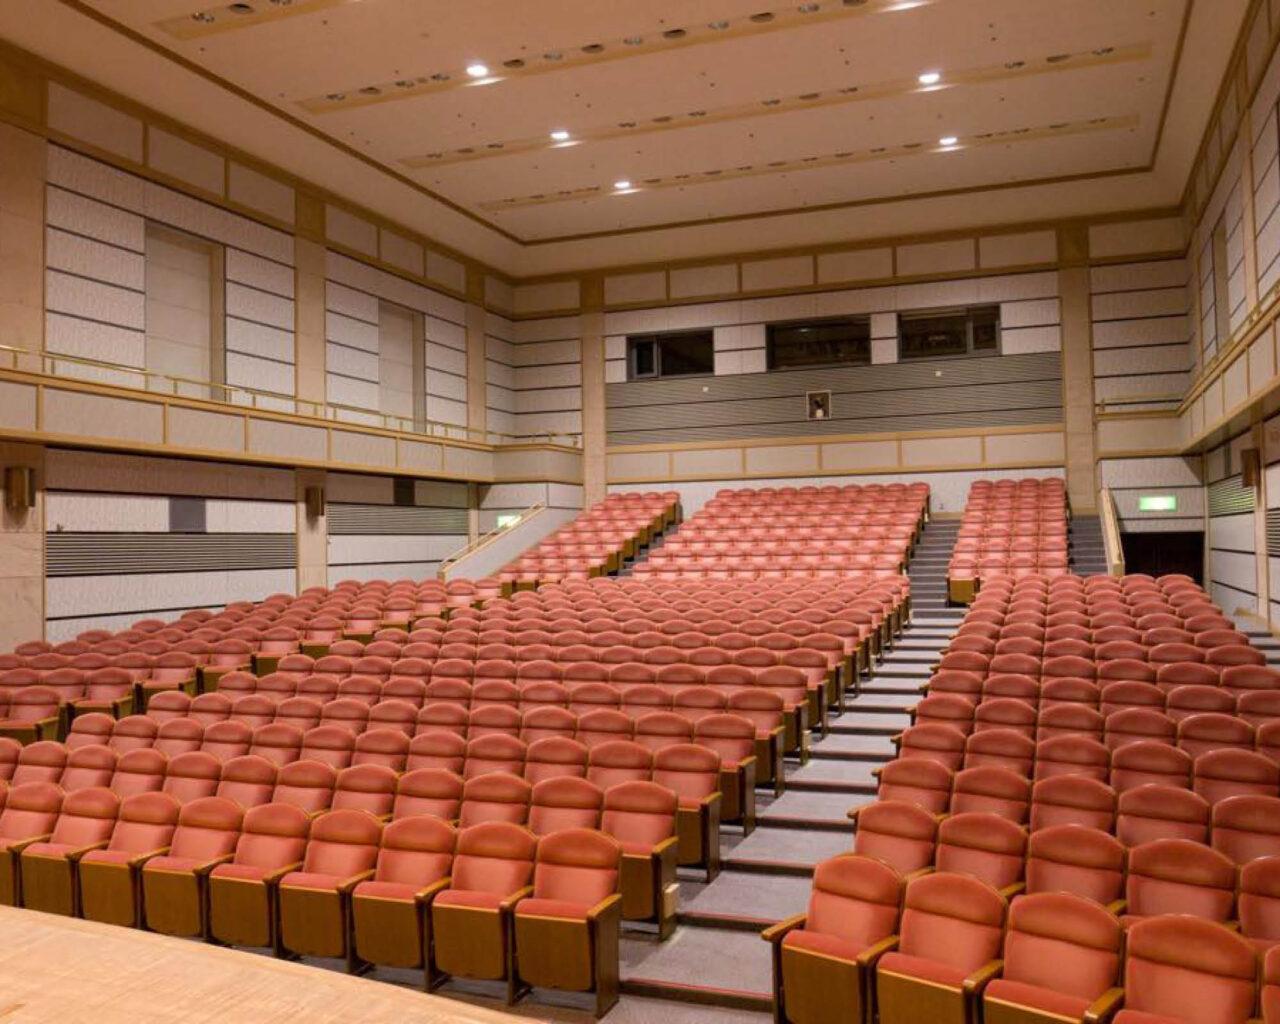 https://www.shizuoka-cb.com/wp-content/uploads/2021/02/photo-venues29-1280x1024.jpg